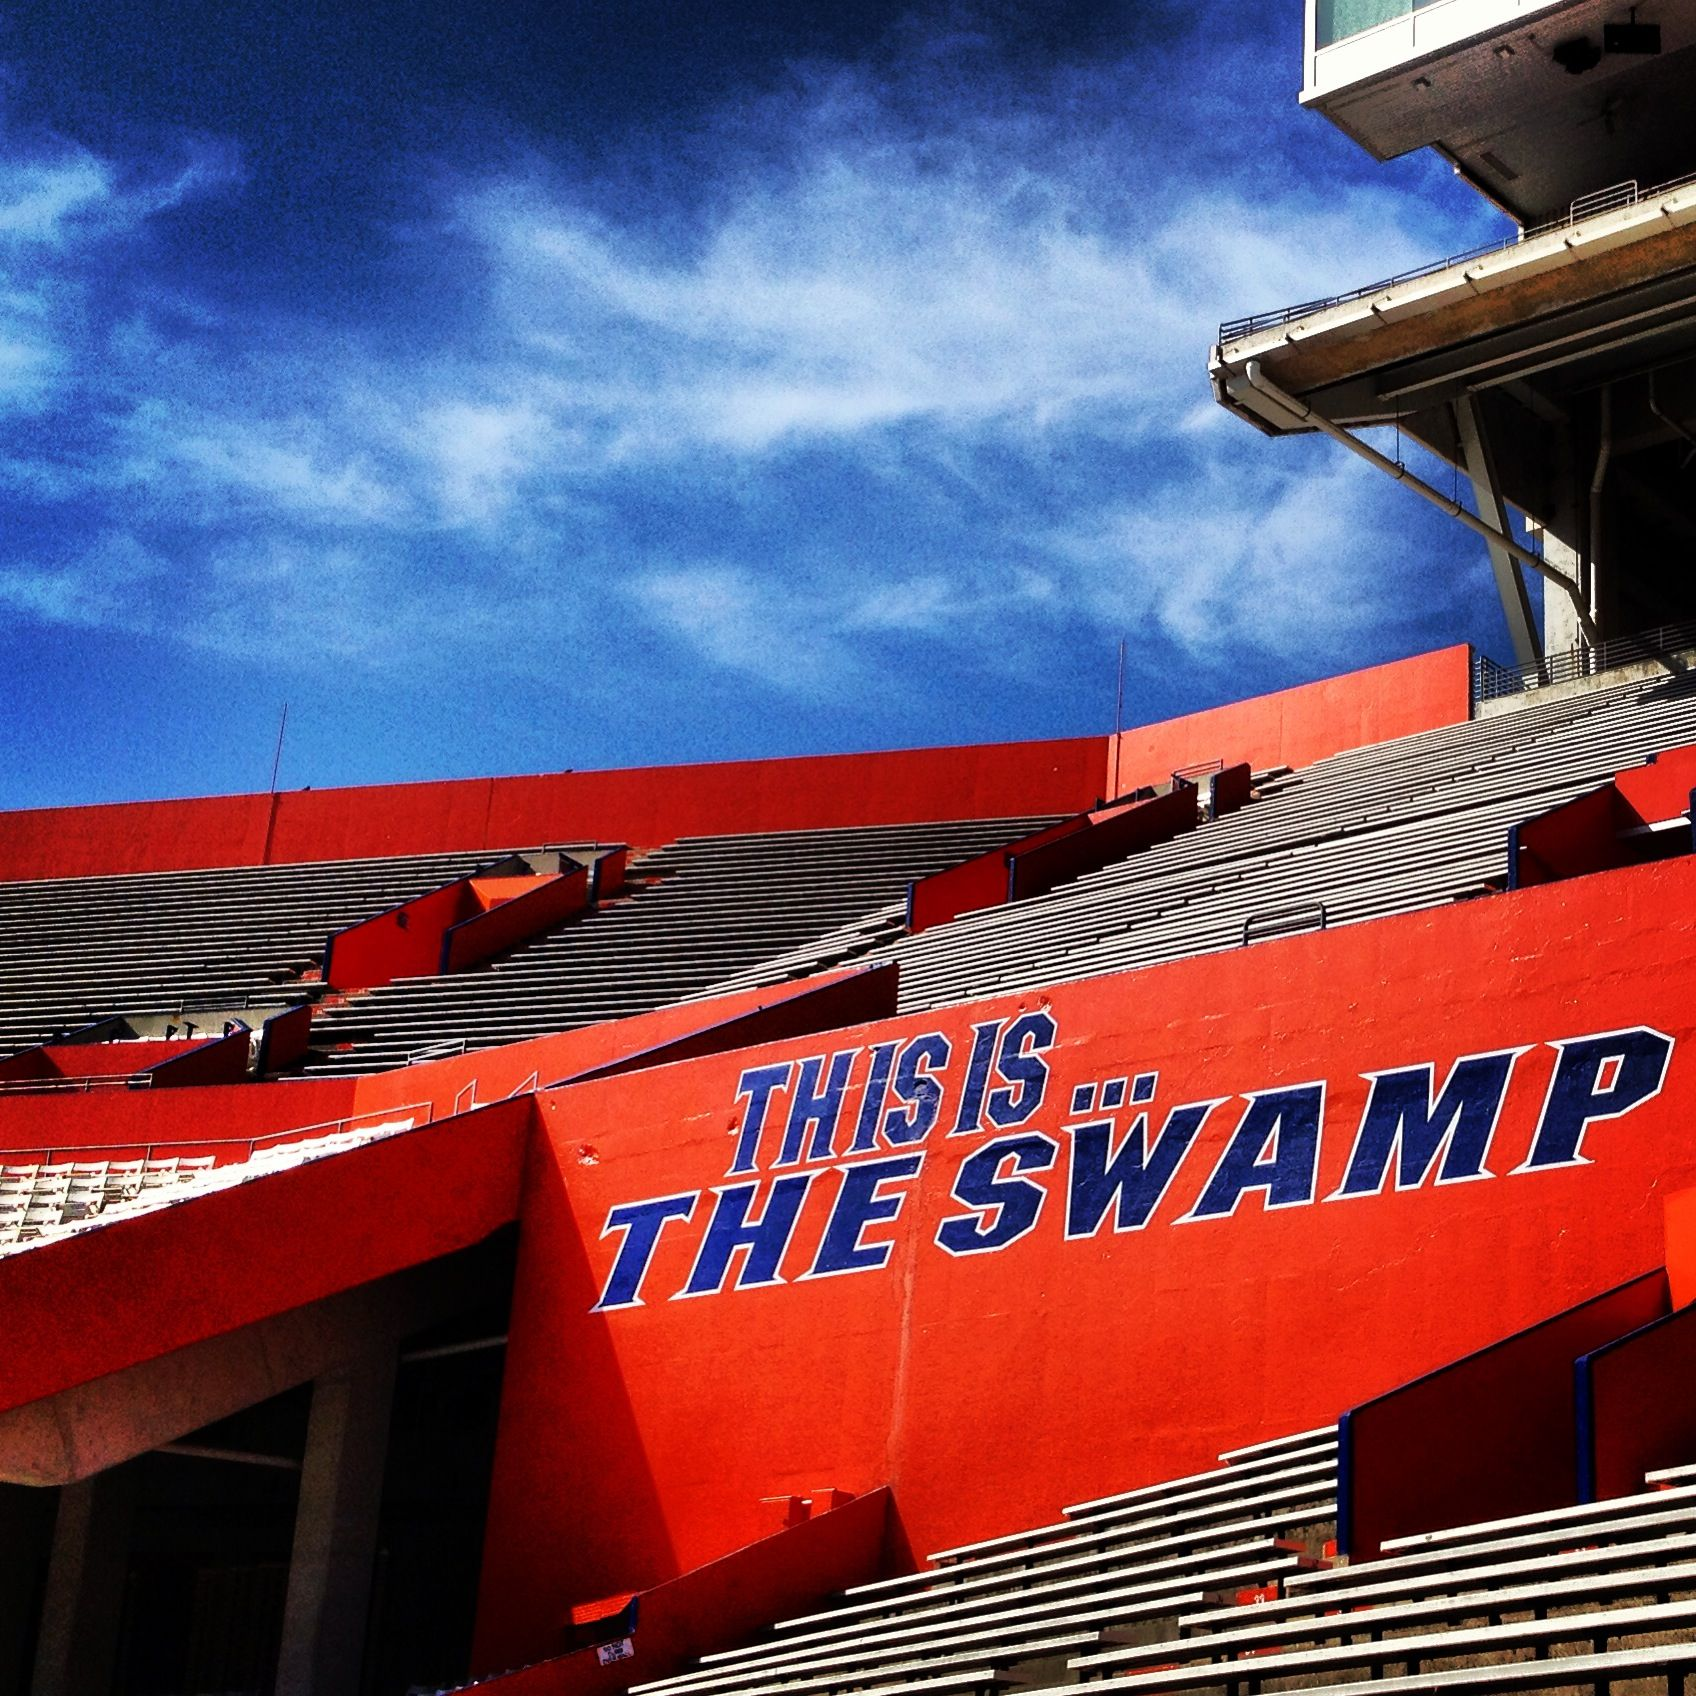 White apron gainesville fl - The Swamp Is Ben Hill Griffin Stadium At Florida Field University Of Florida Gainesville